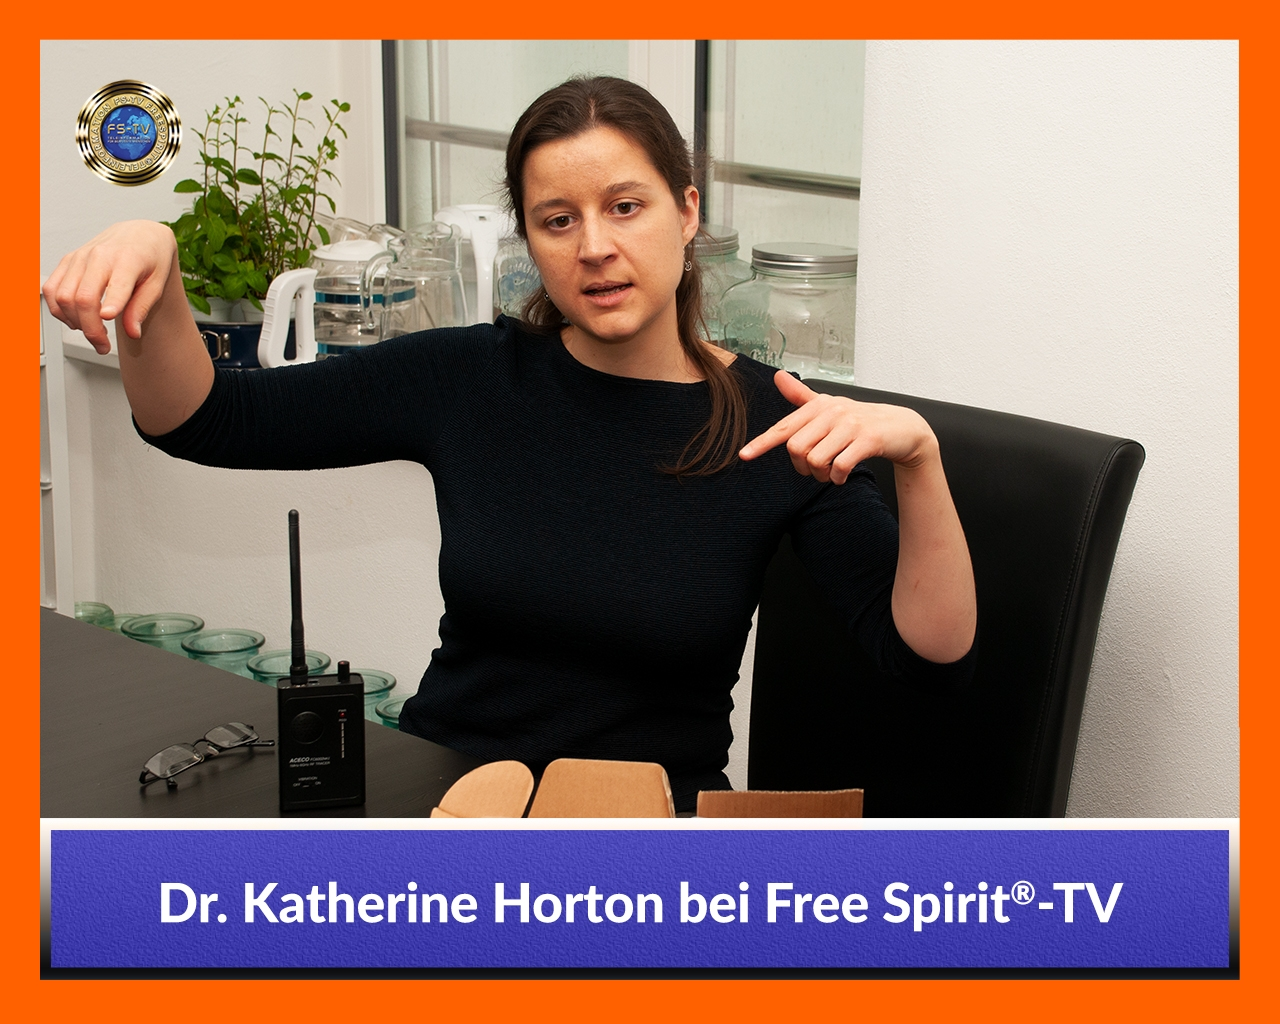 Galleriebild-Dr.Katherine-Horton-6